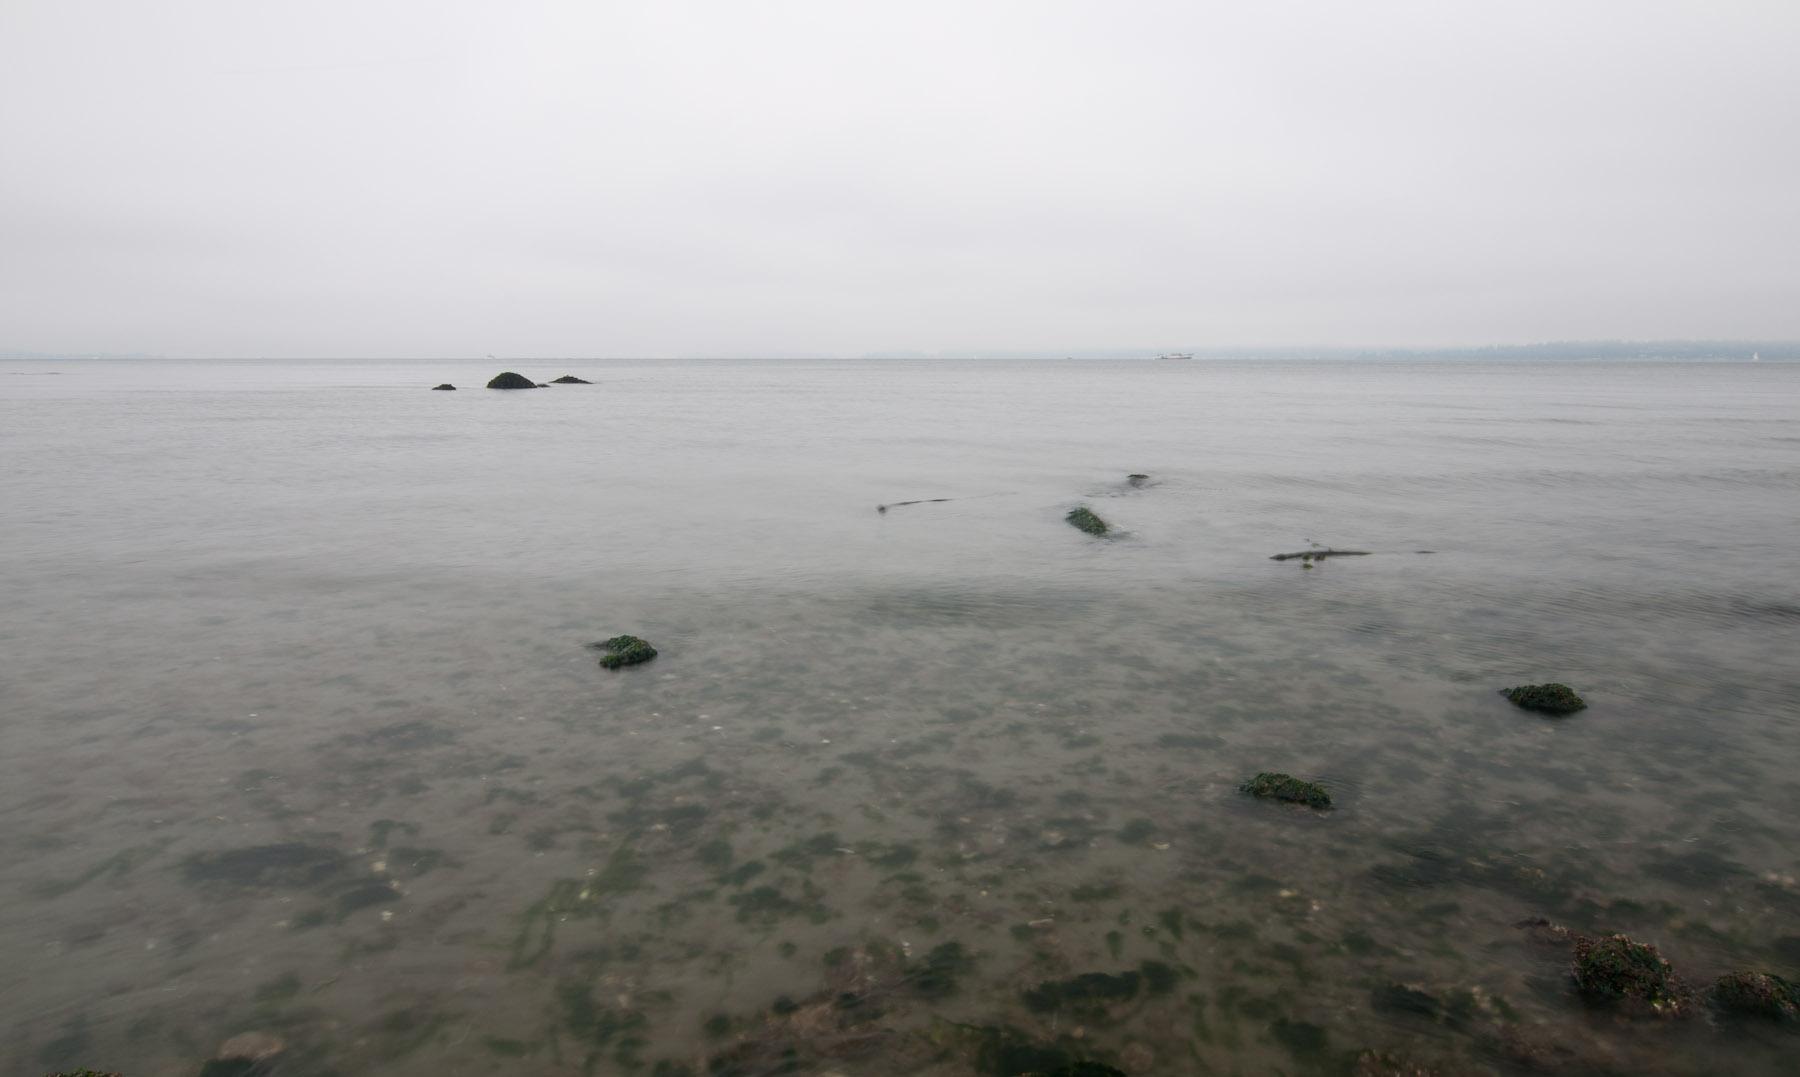 Puget Sound, Discovery Park